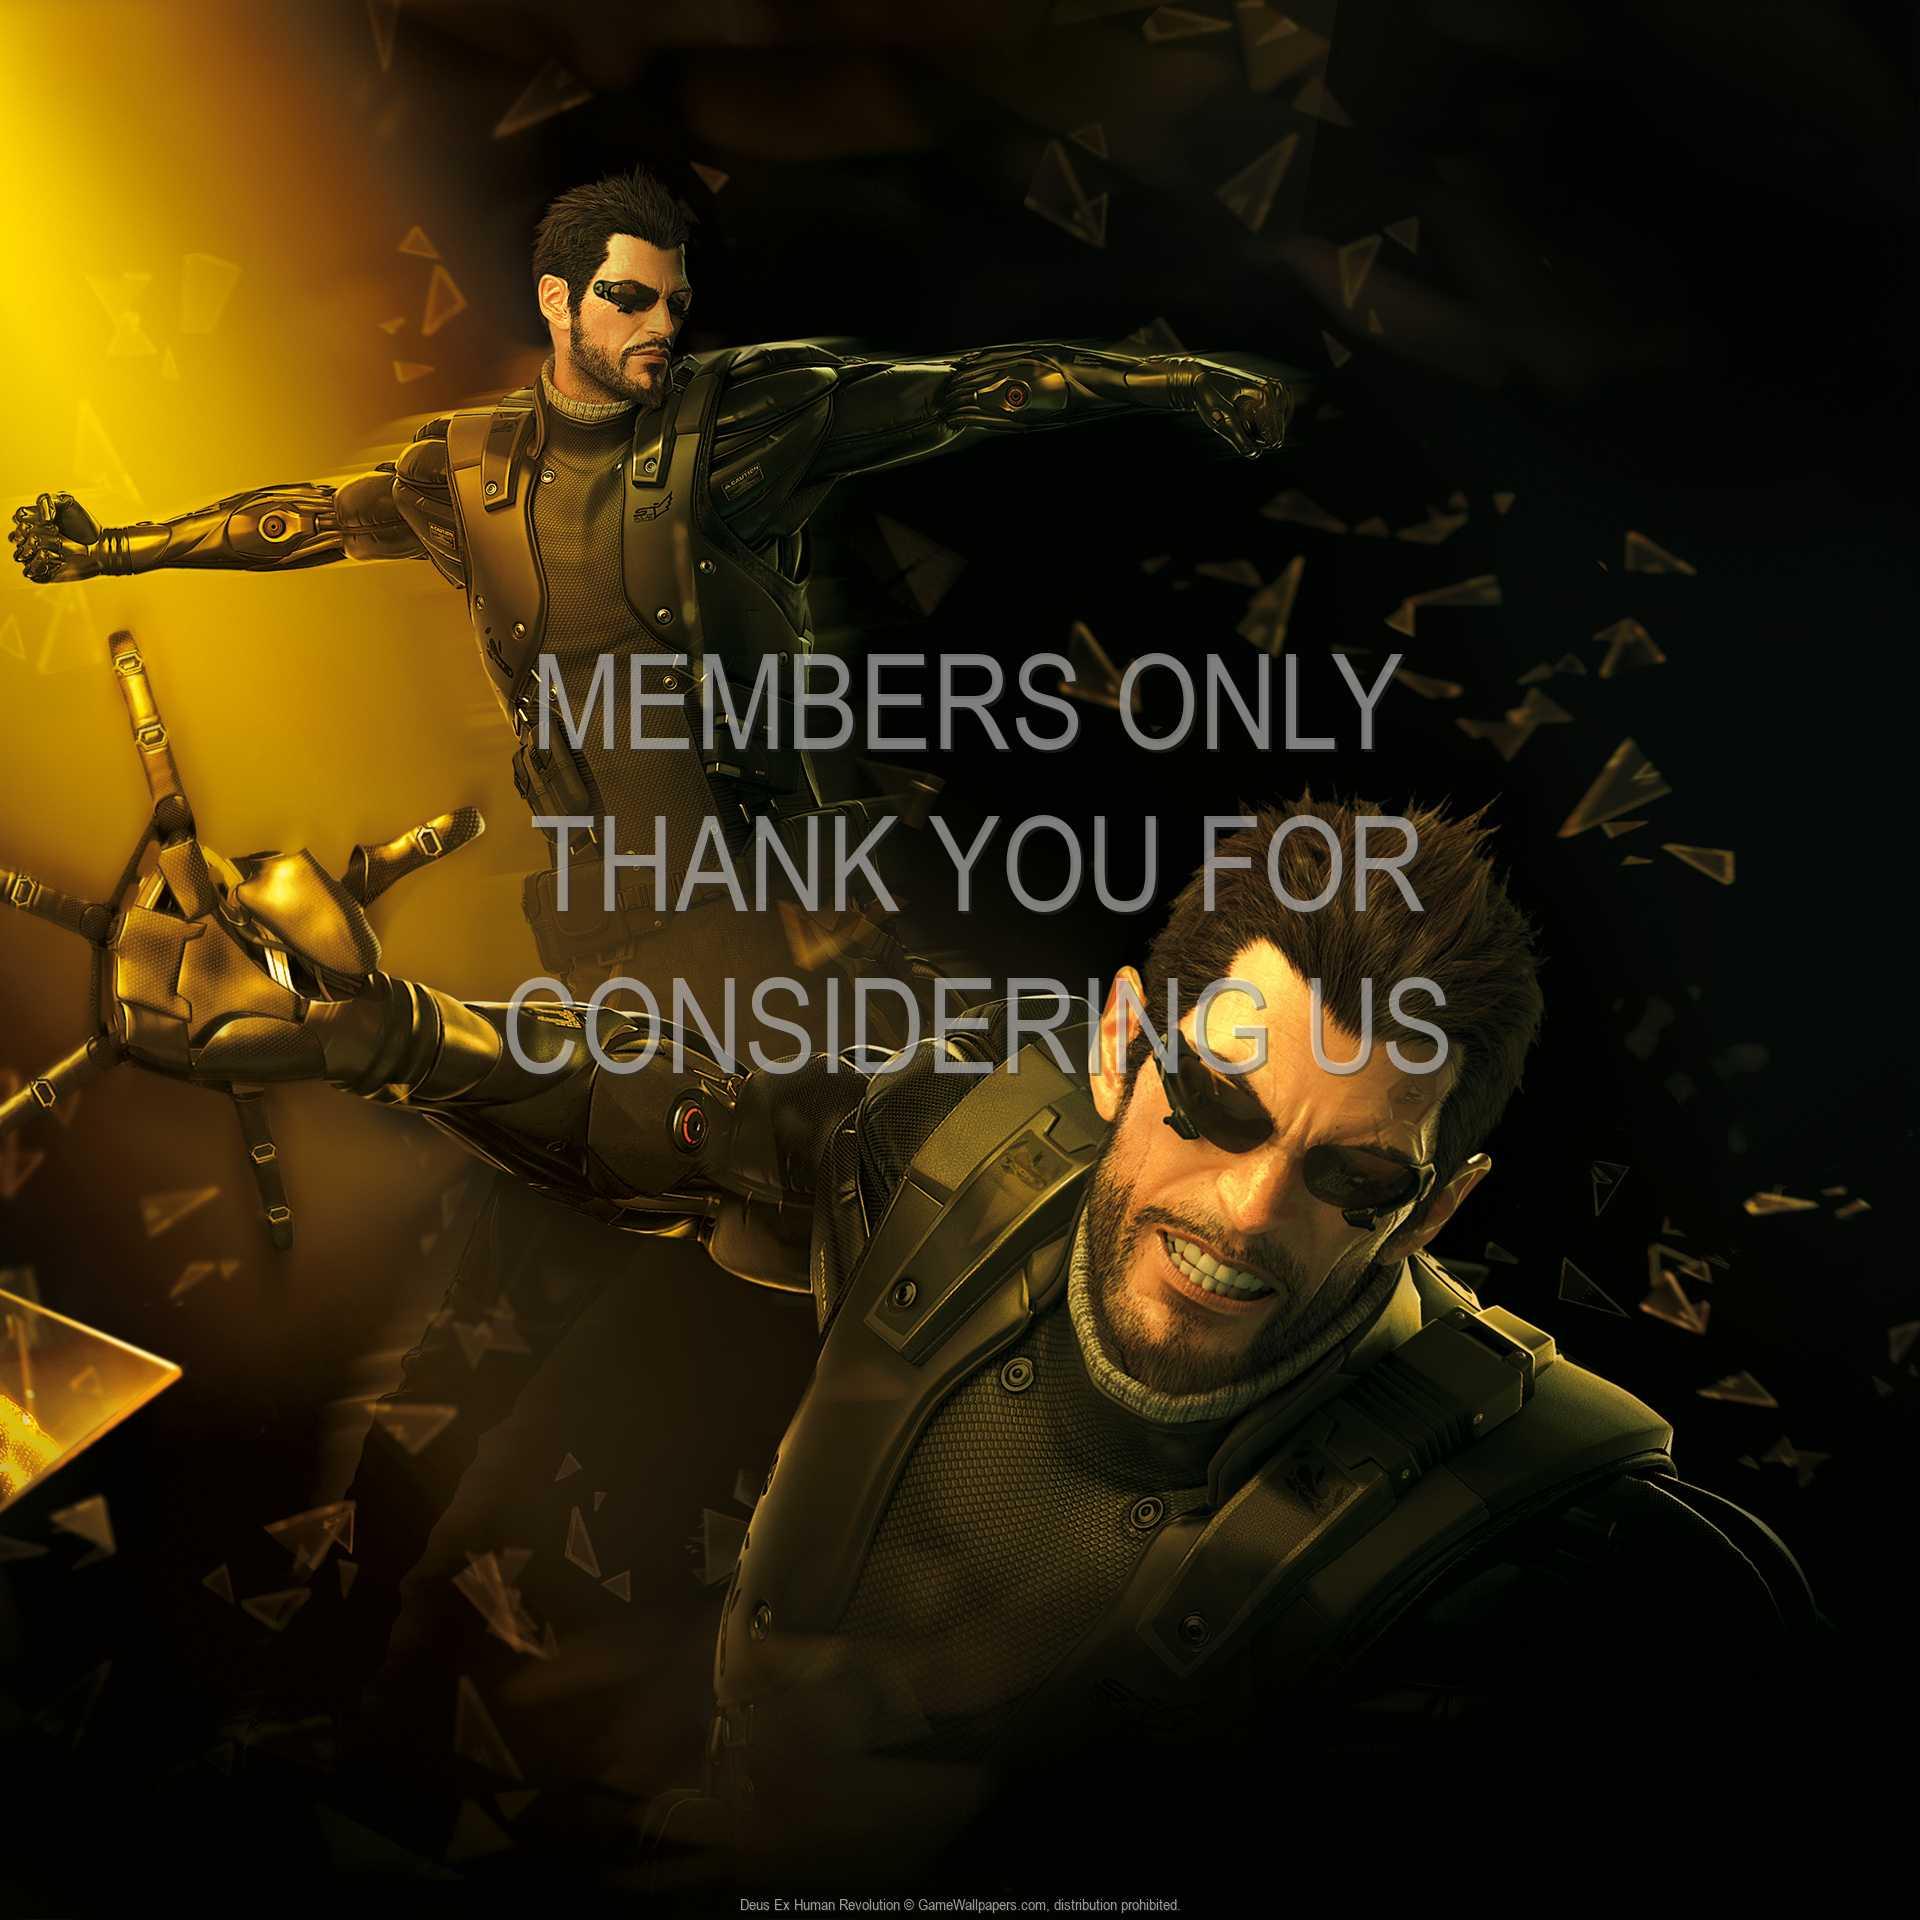 Deus Ex: Human Revolution 1080p Horizontal Handy Hintergrundbild 17